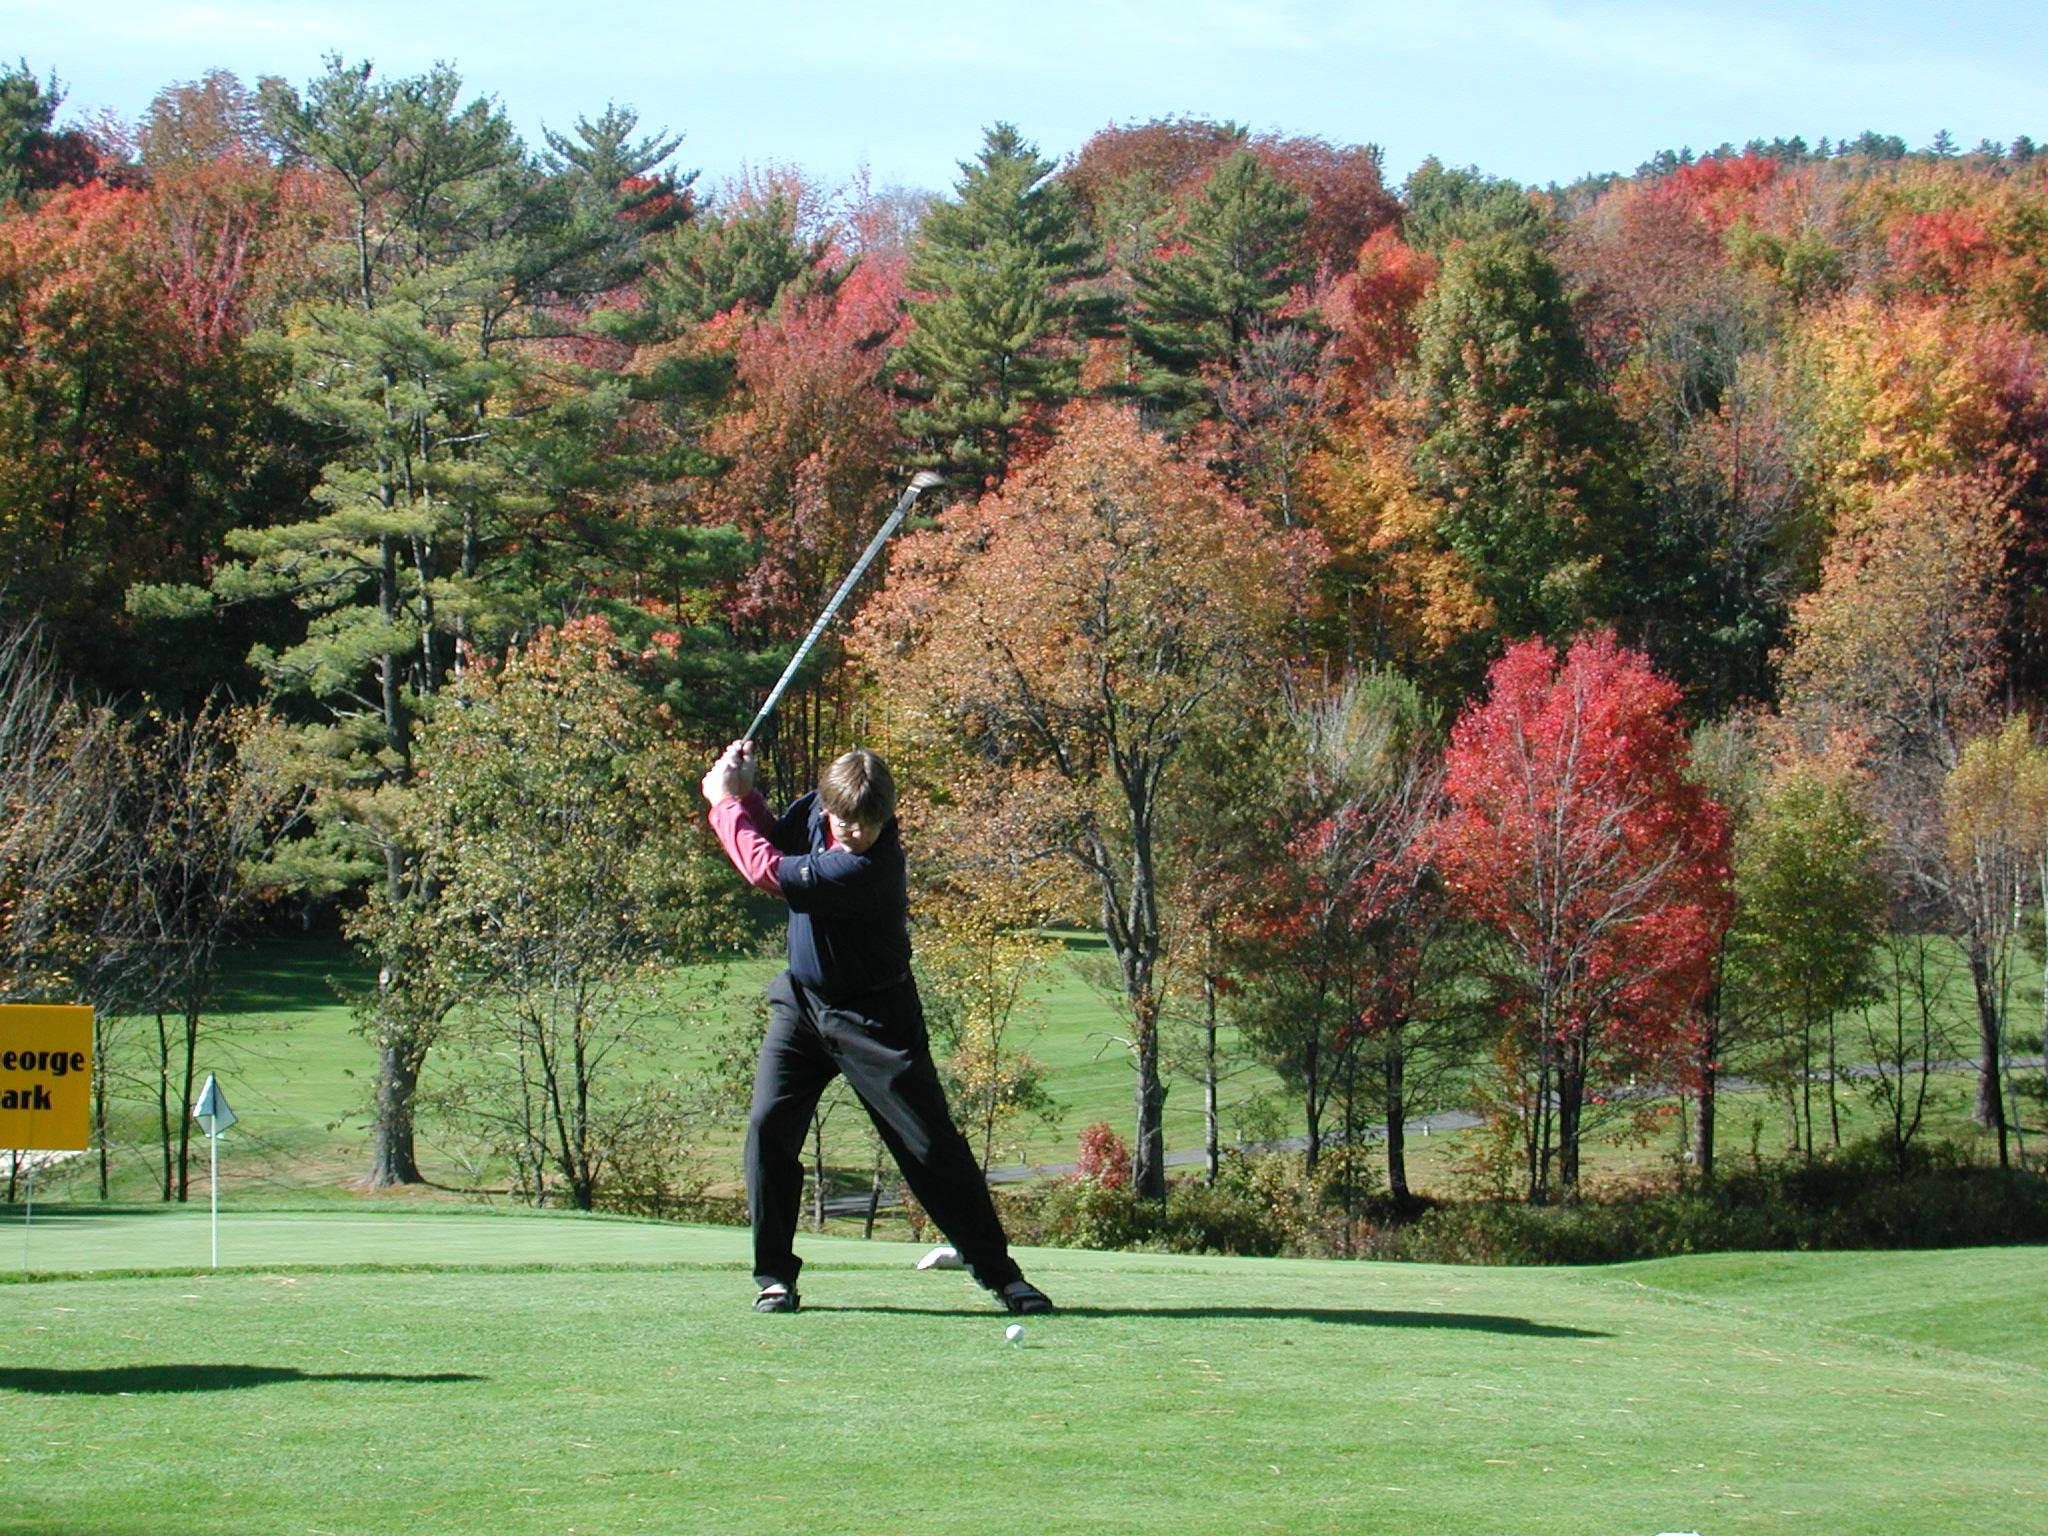 man golfing during the fall season